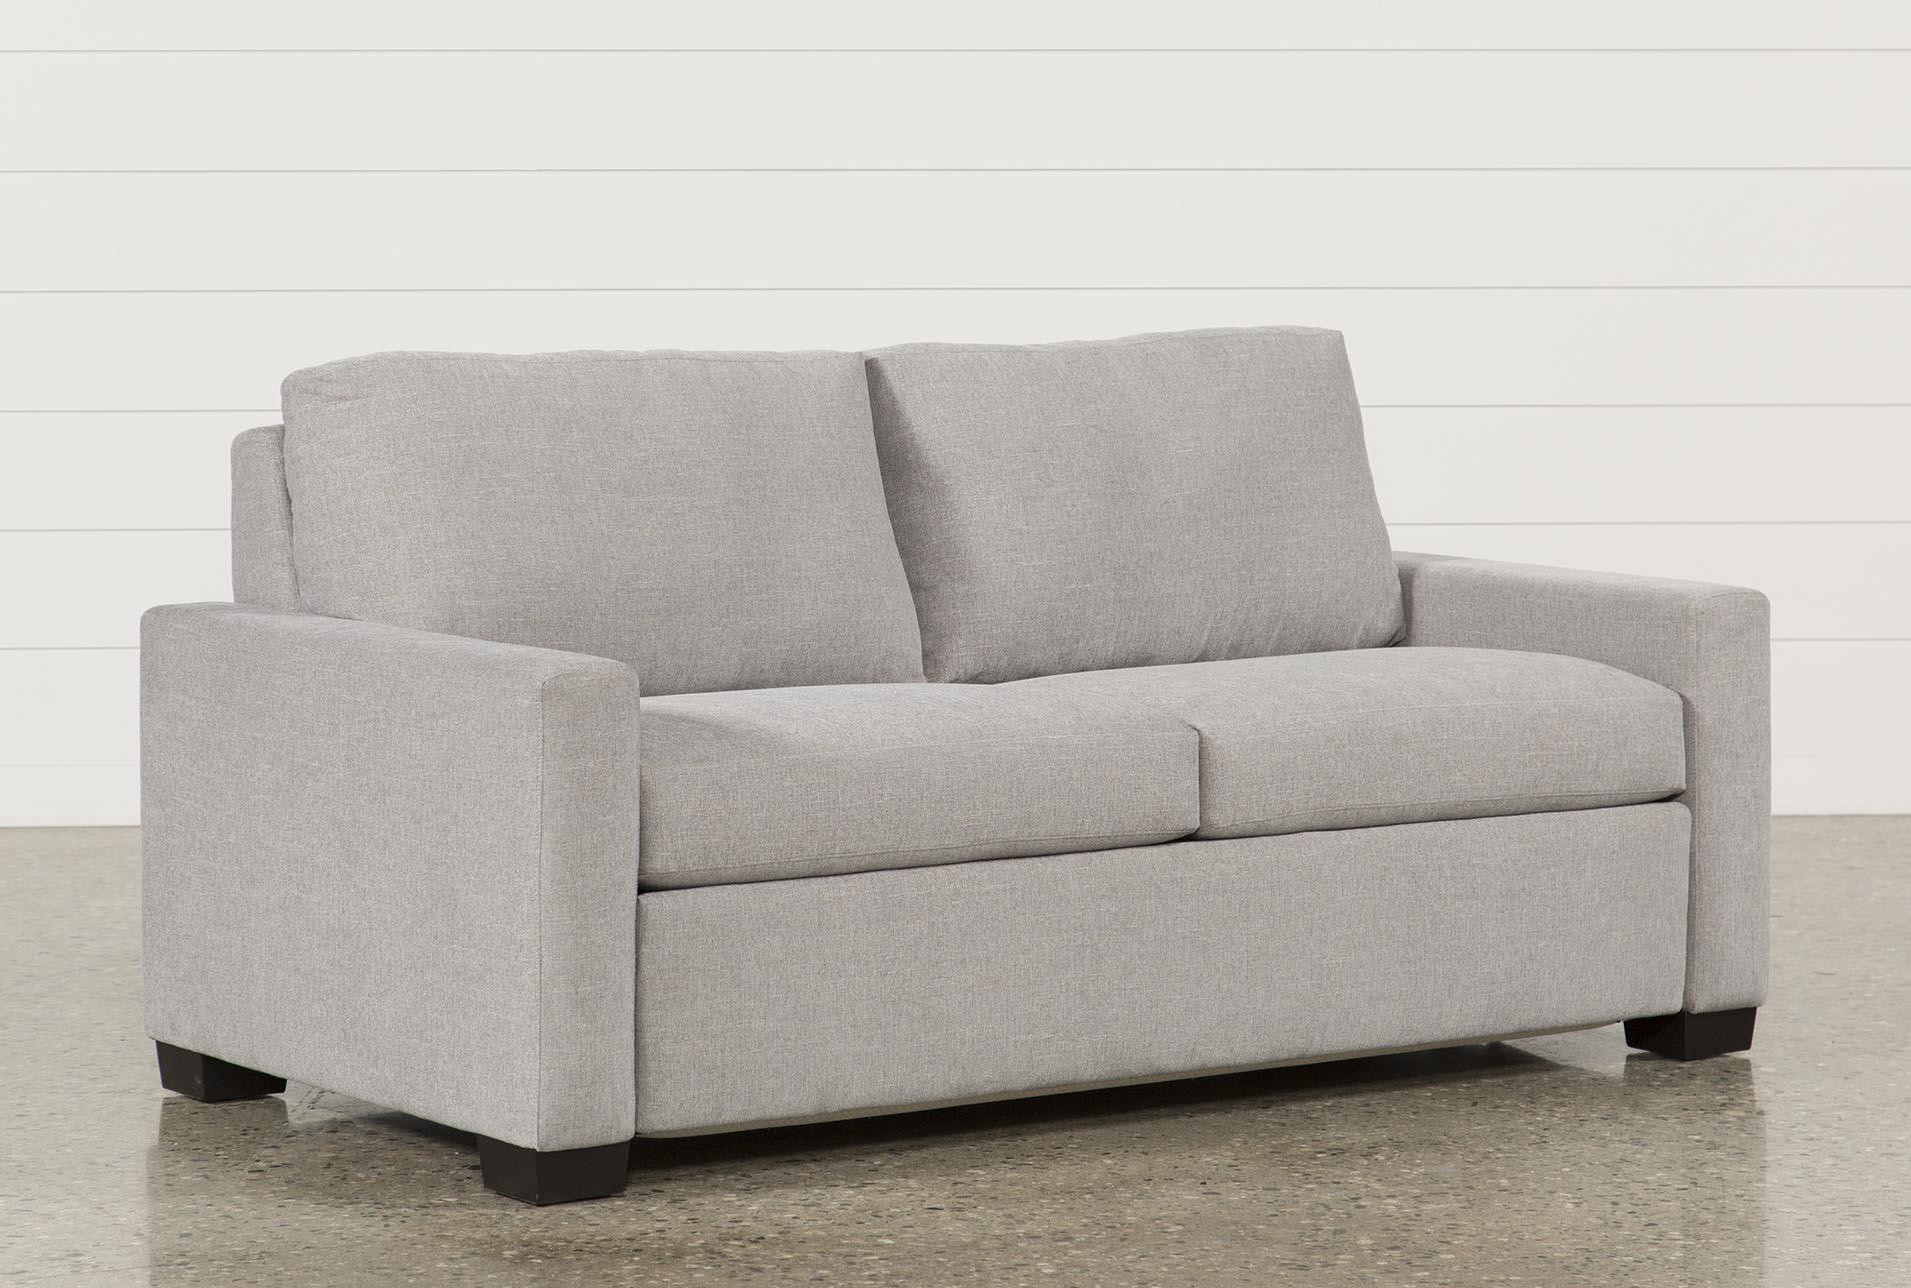 mackenzie silverpine queen sofa sleeper living spaces rh livingspaces com sofa sleeper with air mattress sofa sleeper with storage